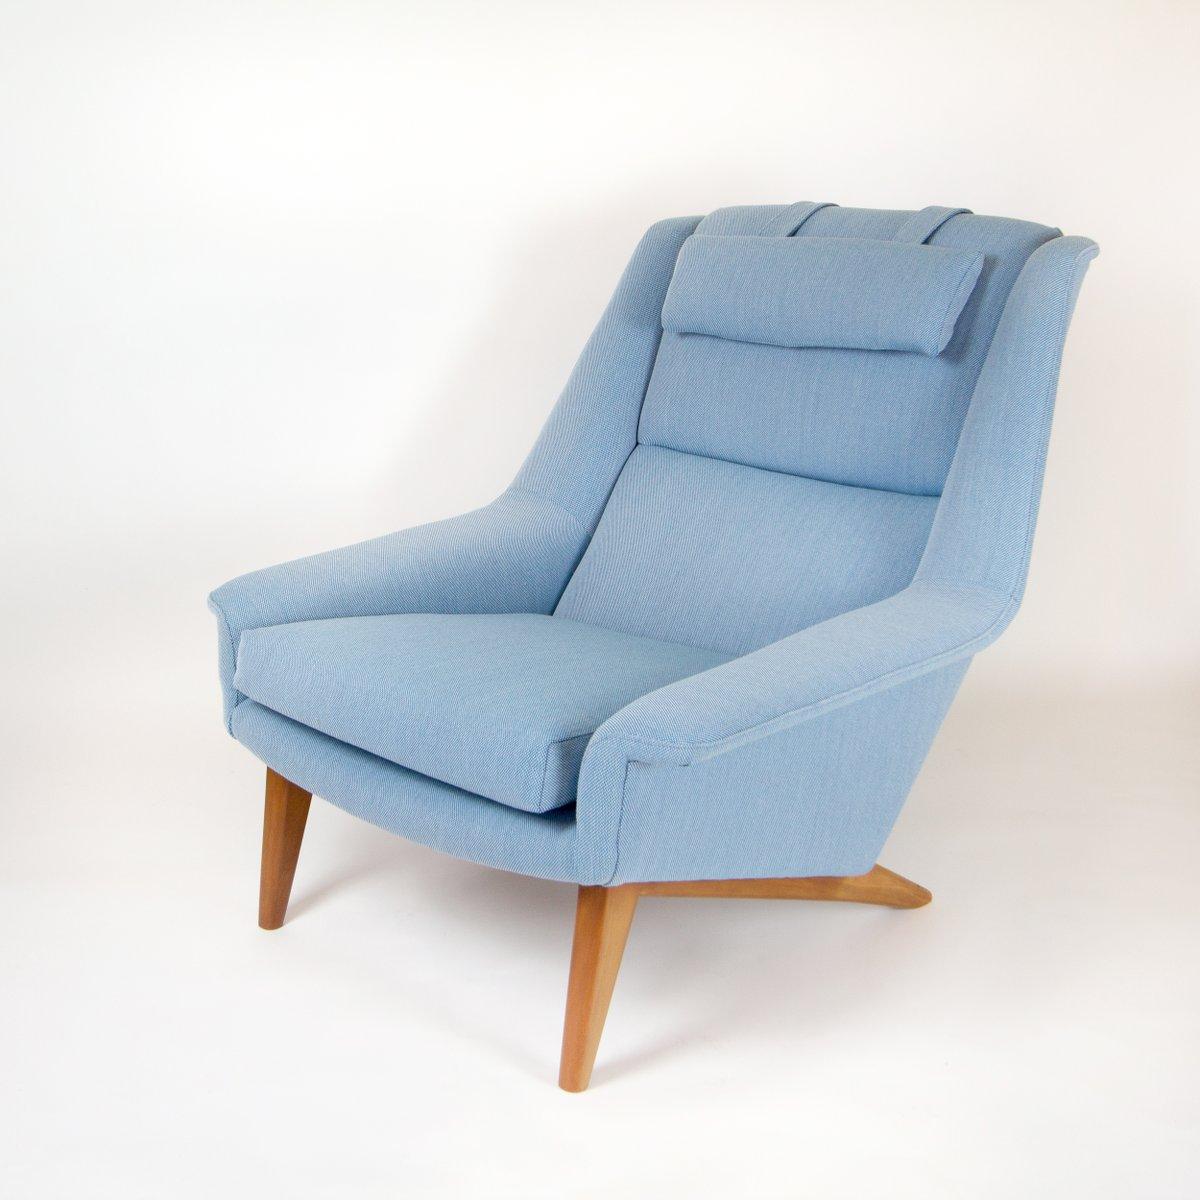 Modell 4410 Sessel von Folke Ohlsson für Fritz Hansen, 1960er